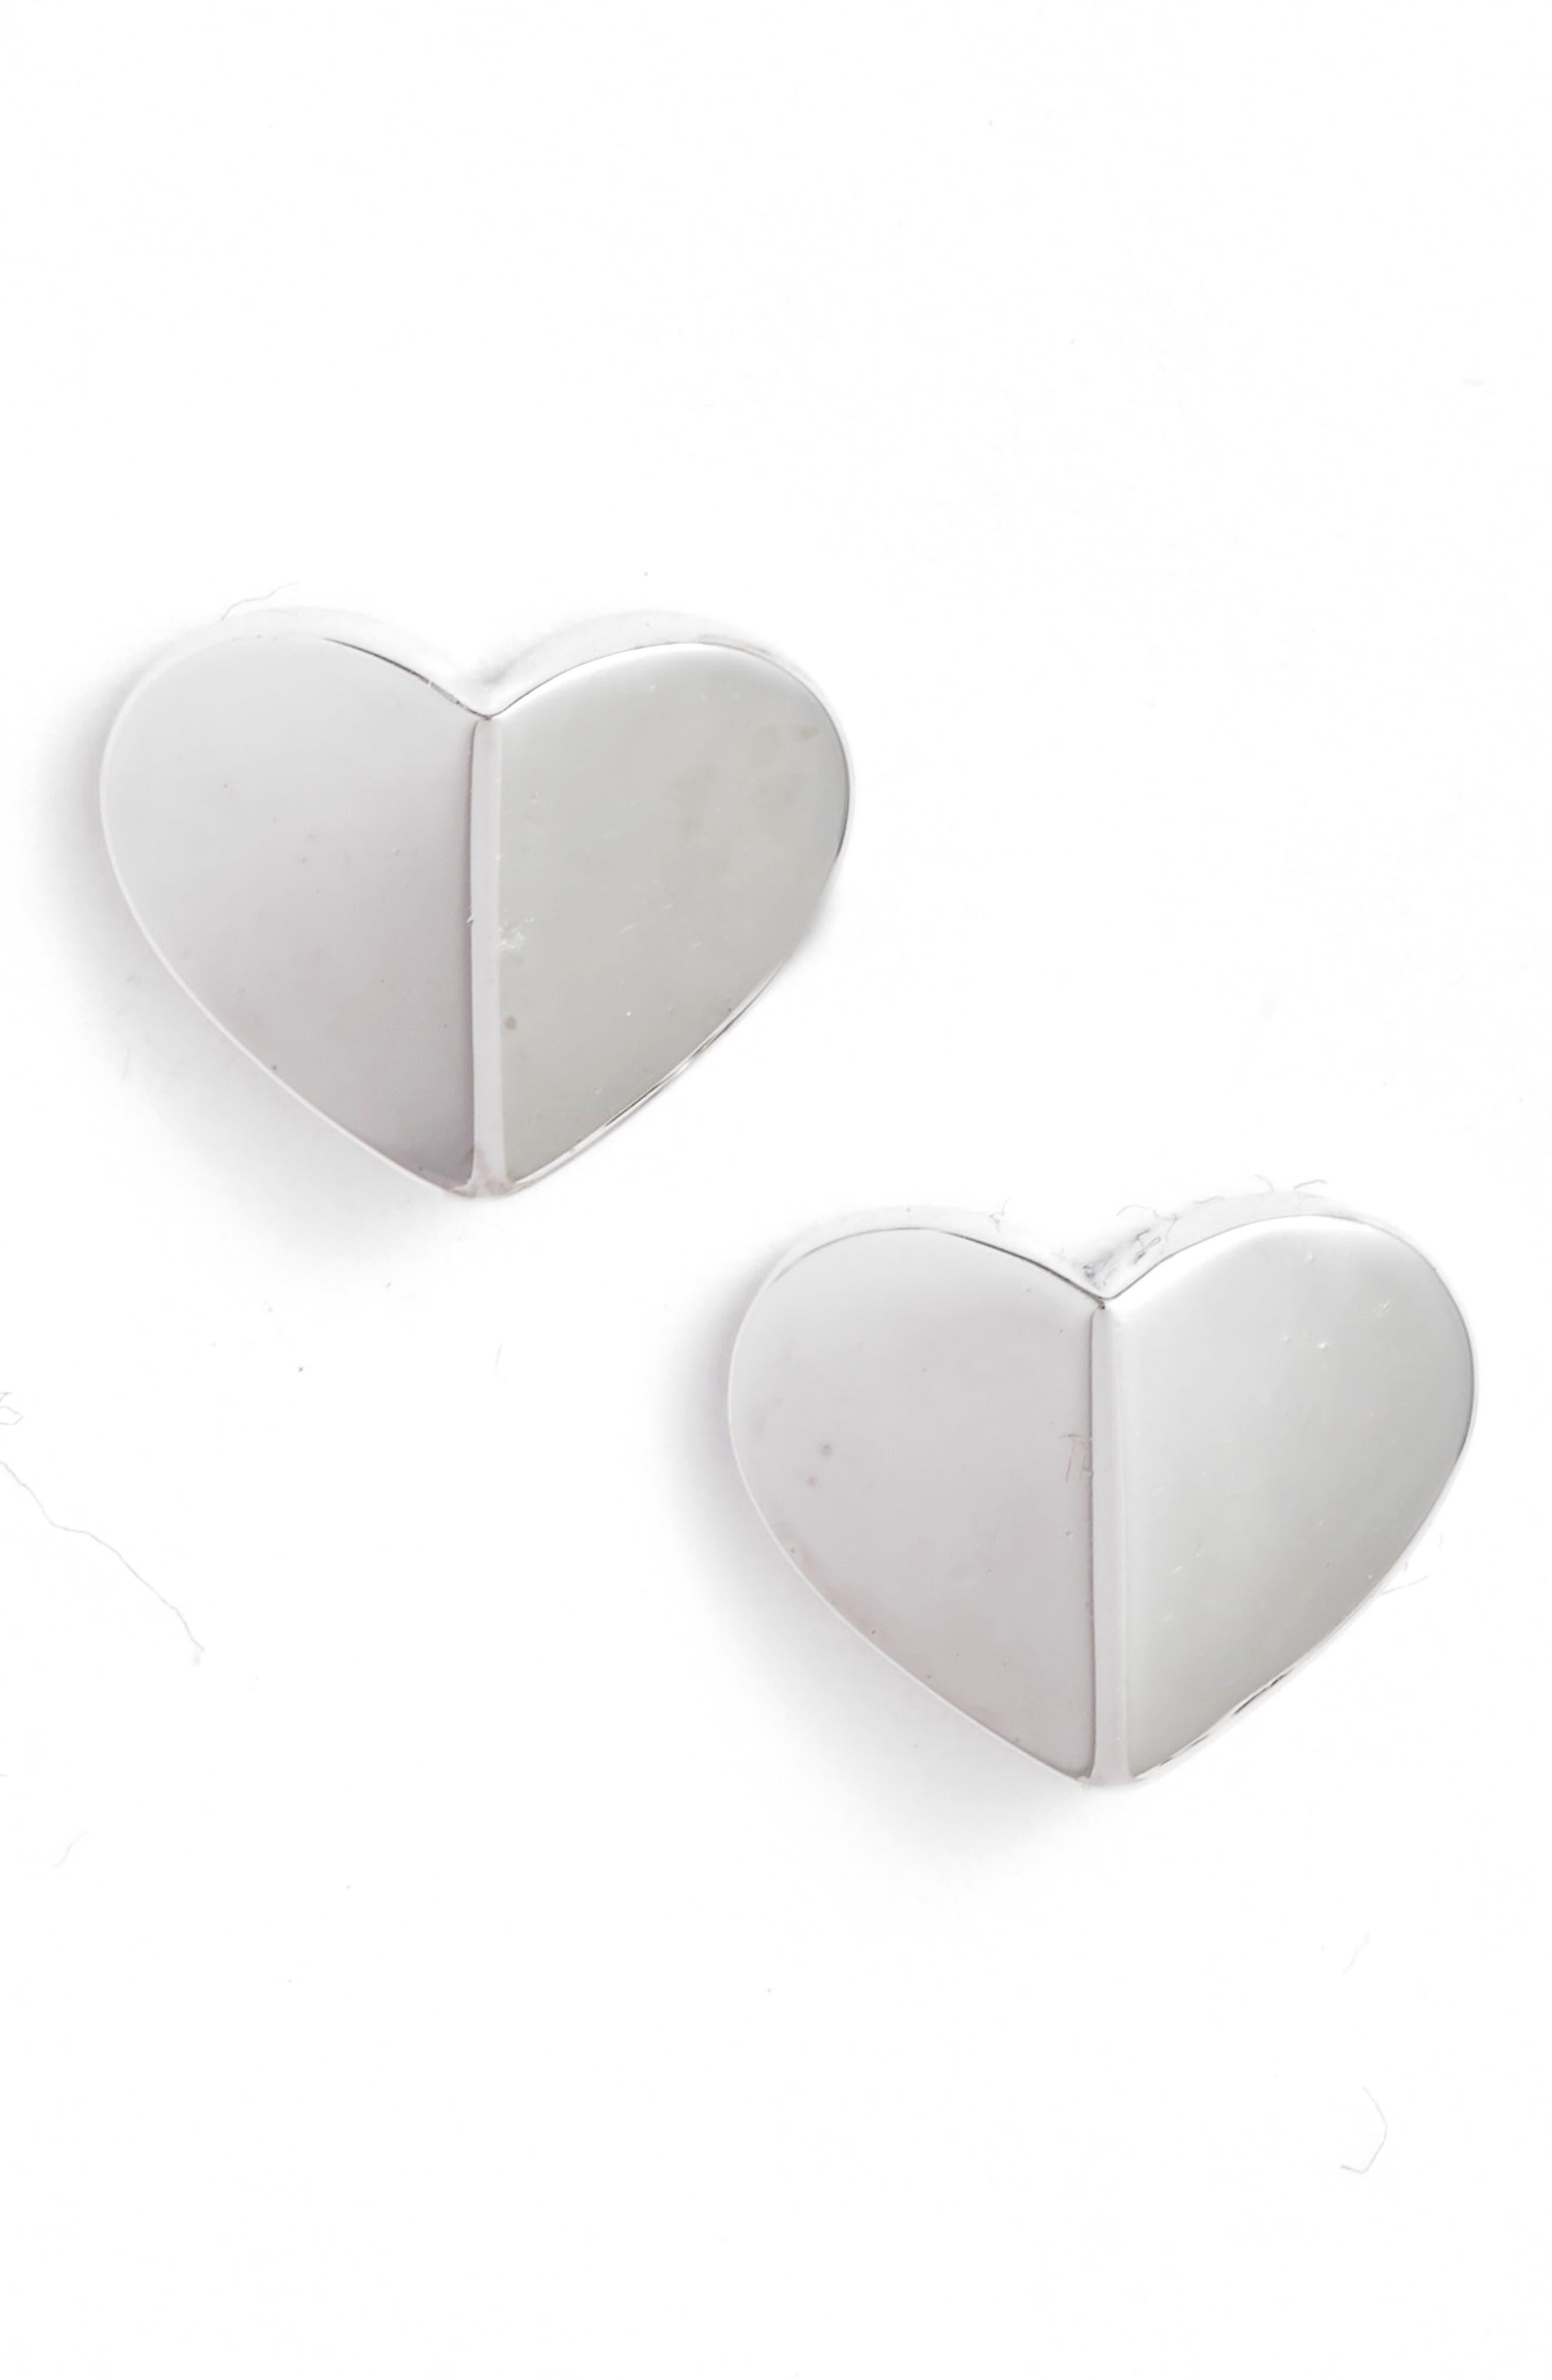 Kate Spade New York Jewelry small heart stud earrings